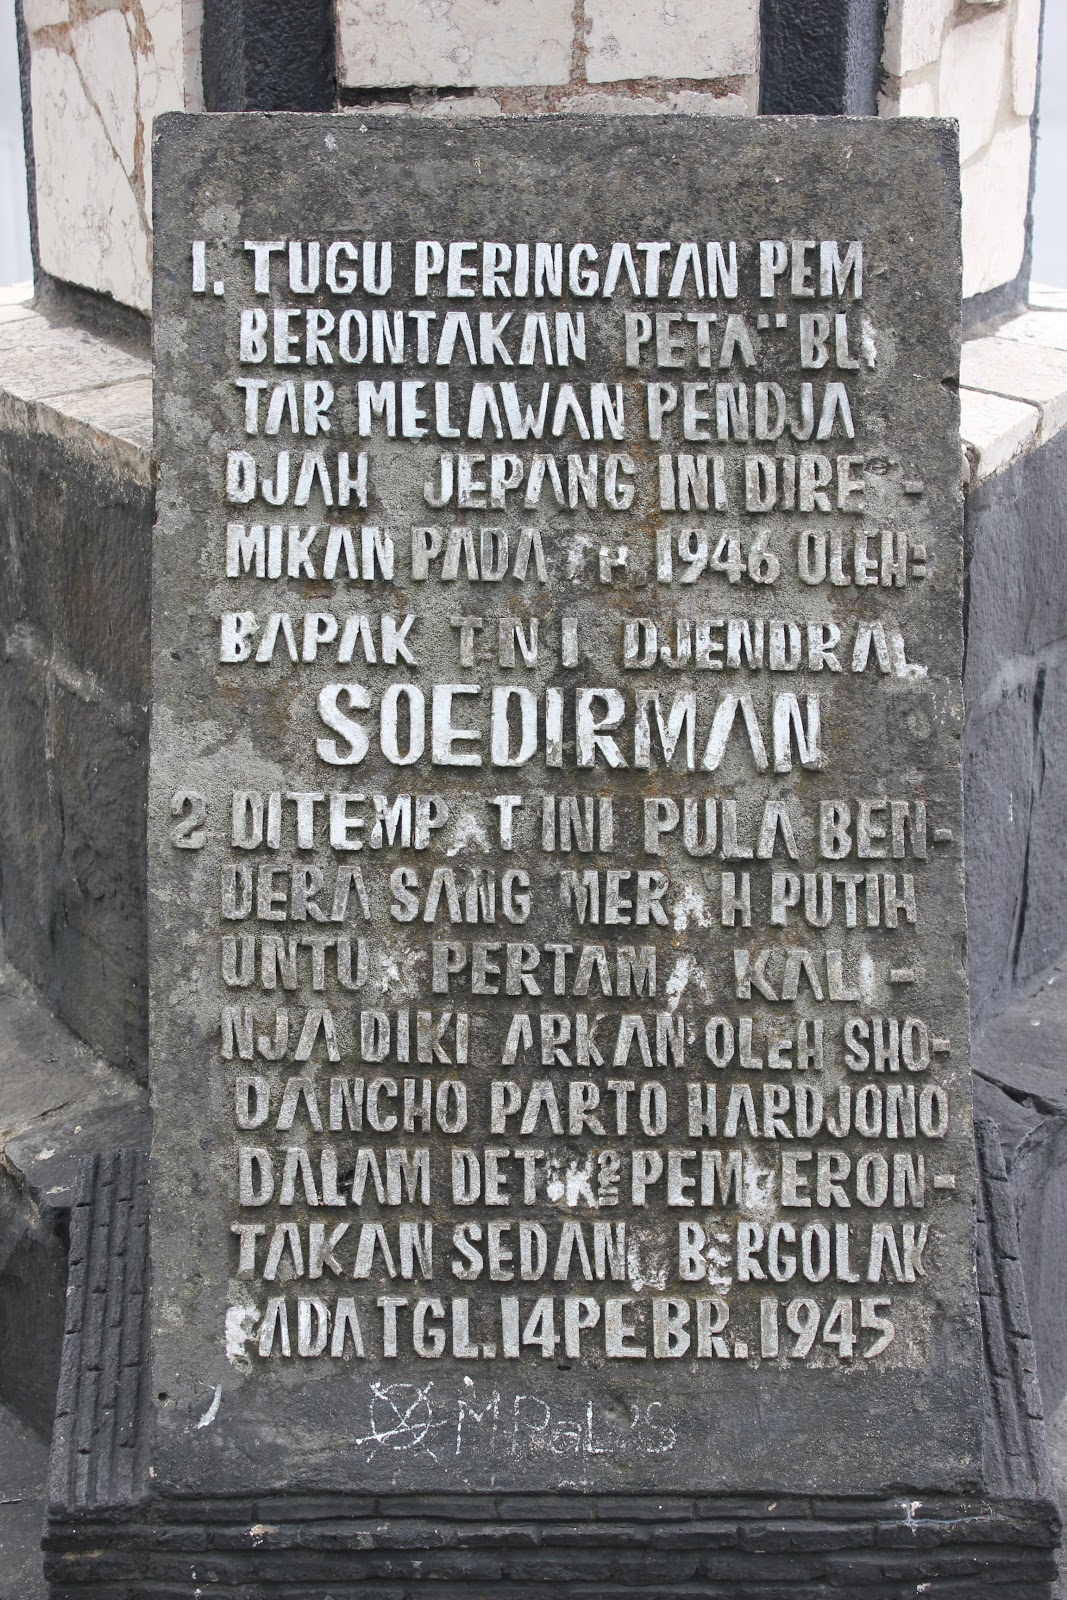 Monumen Potlot Telisik Aneka Prasasti Peta Kab Blitar